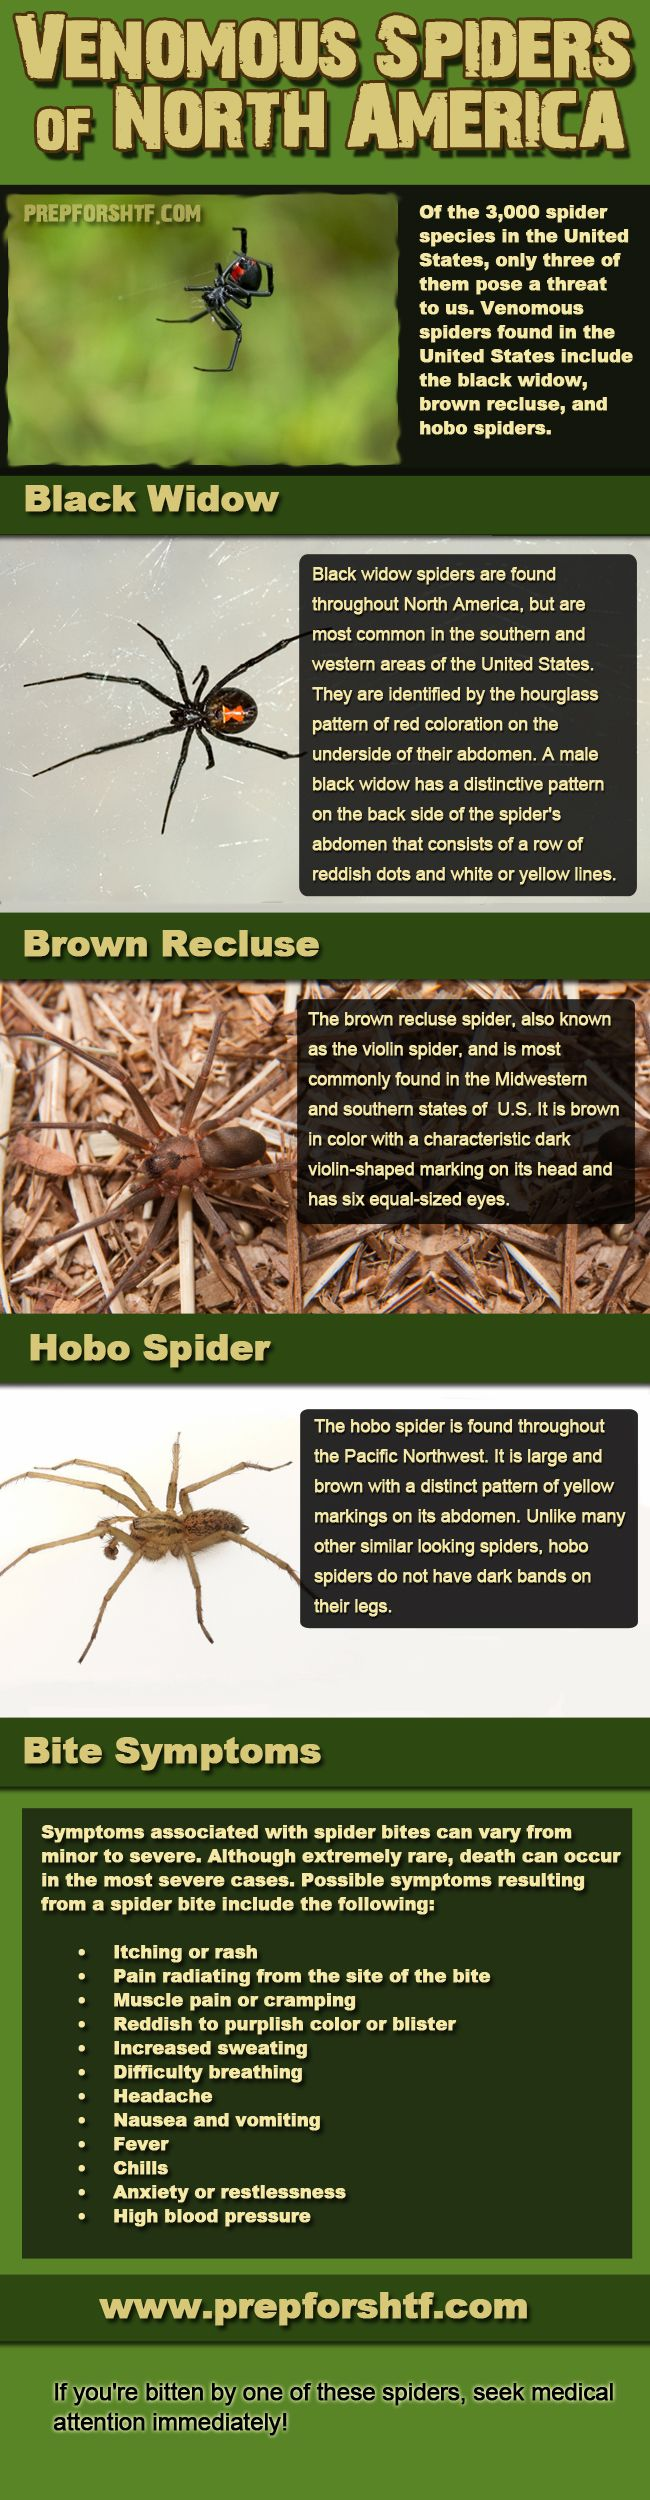 Venomous Spiders of North America Infographic